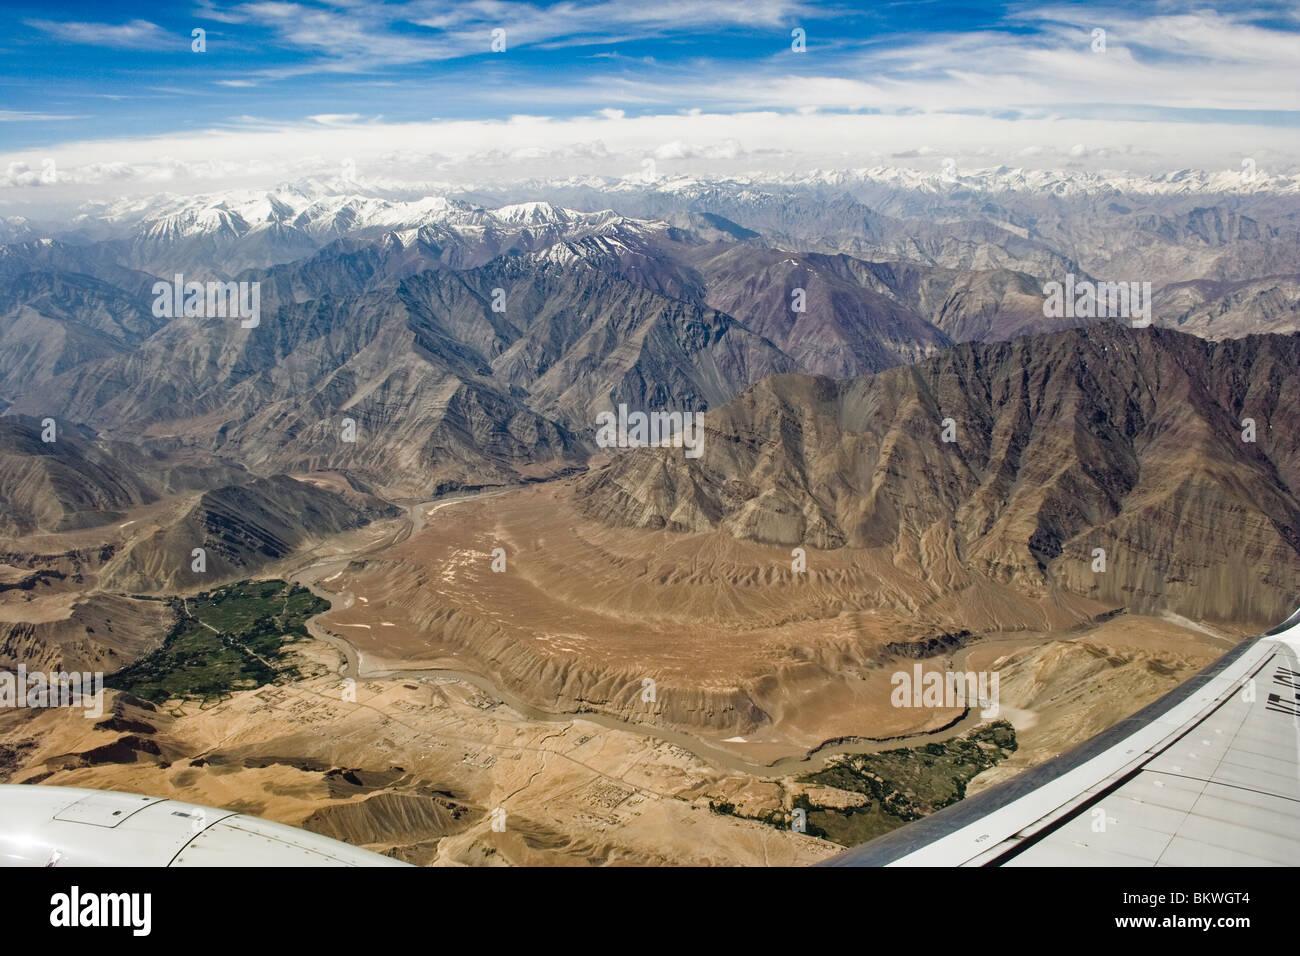 Vista aerea del Himalaya Immagini Stock